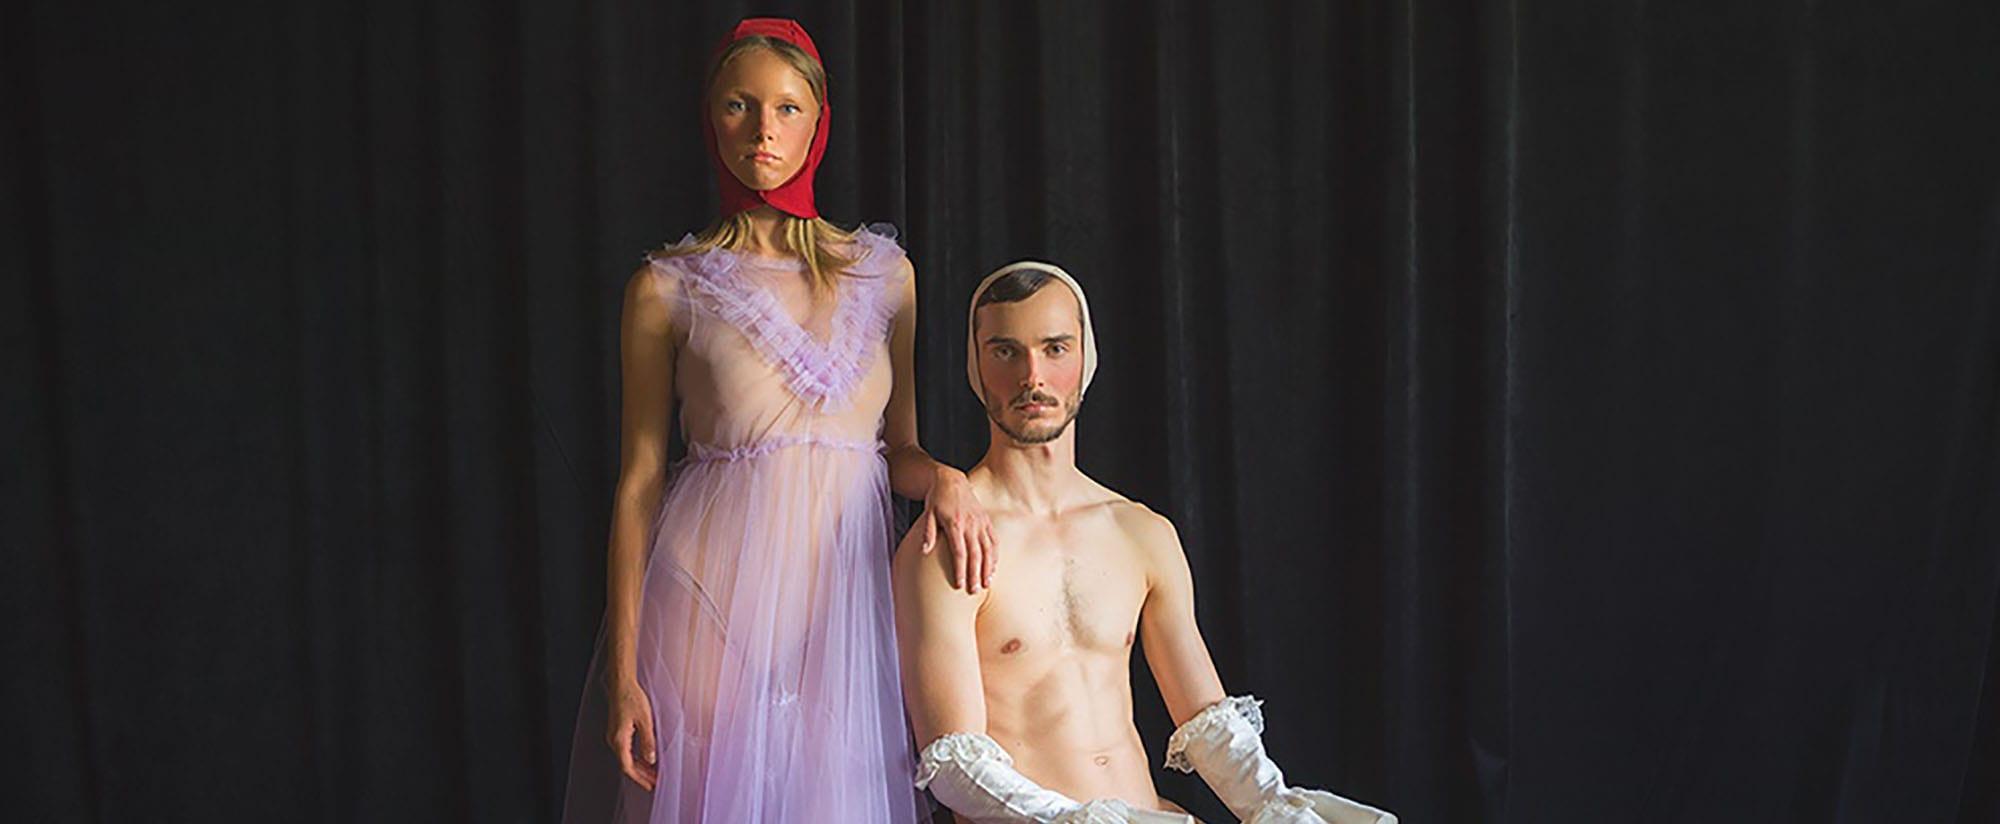 Fashion Israel, מגזין אופנה, אופנה, איפור, שקיפות ועירום, איפור ירין שחף, - צילום מיכל חלבין